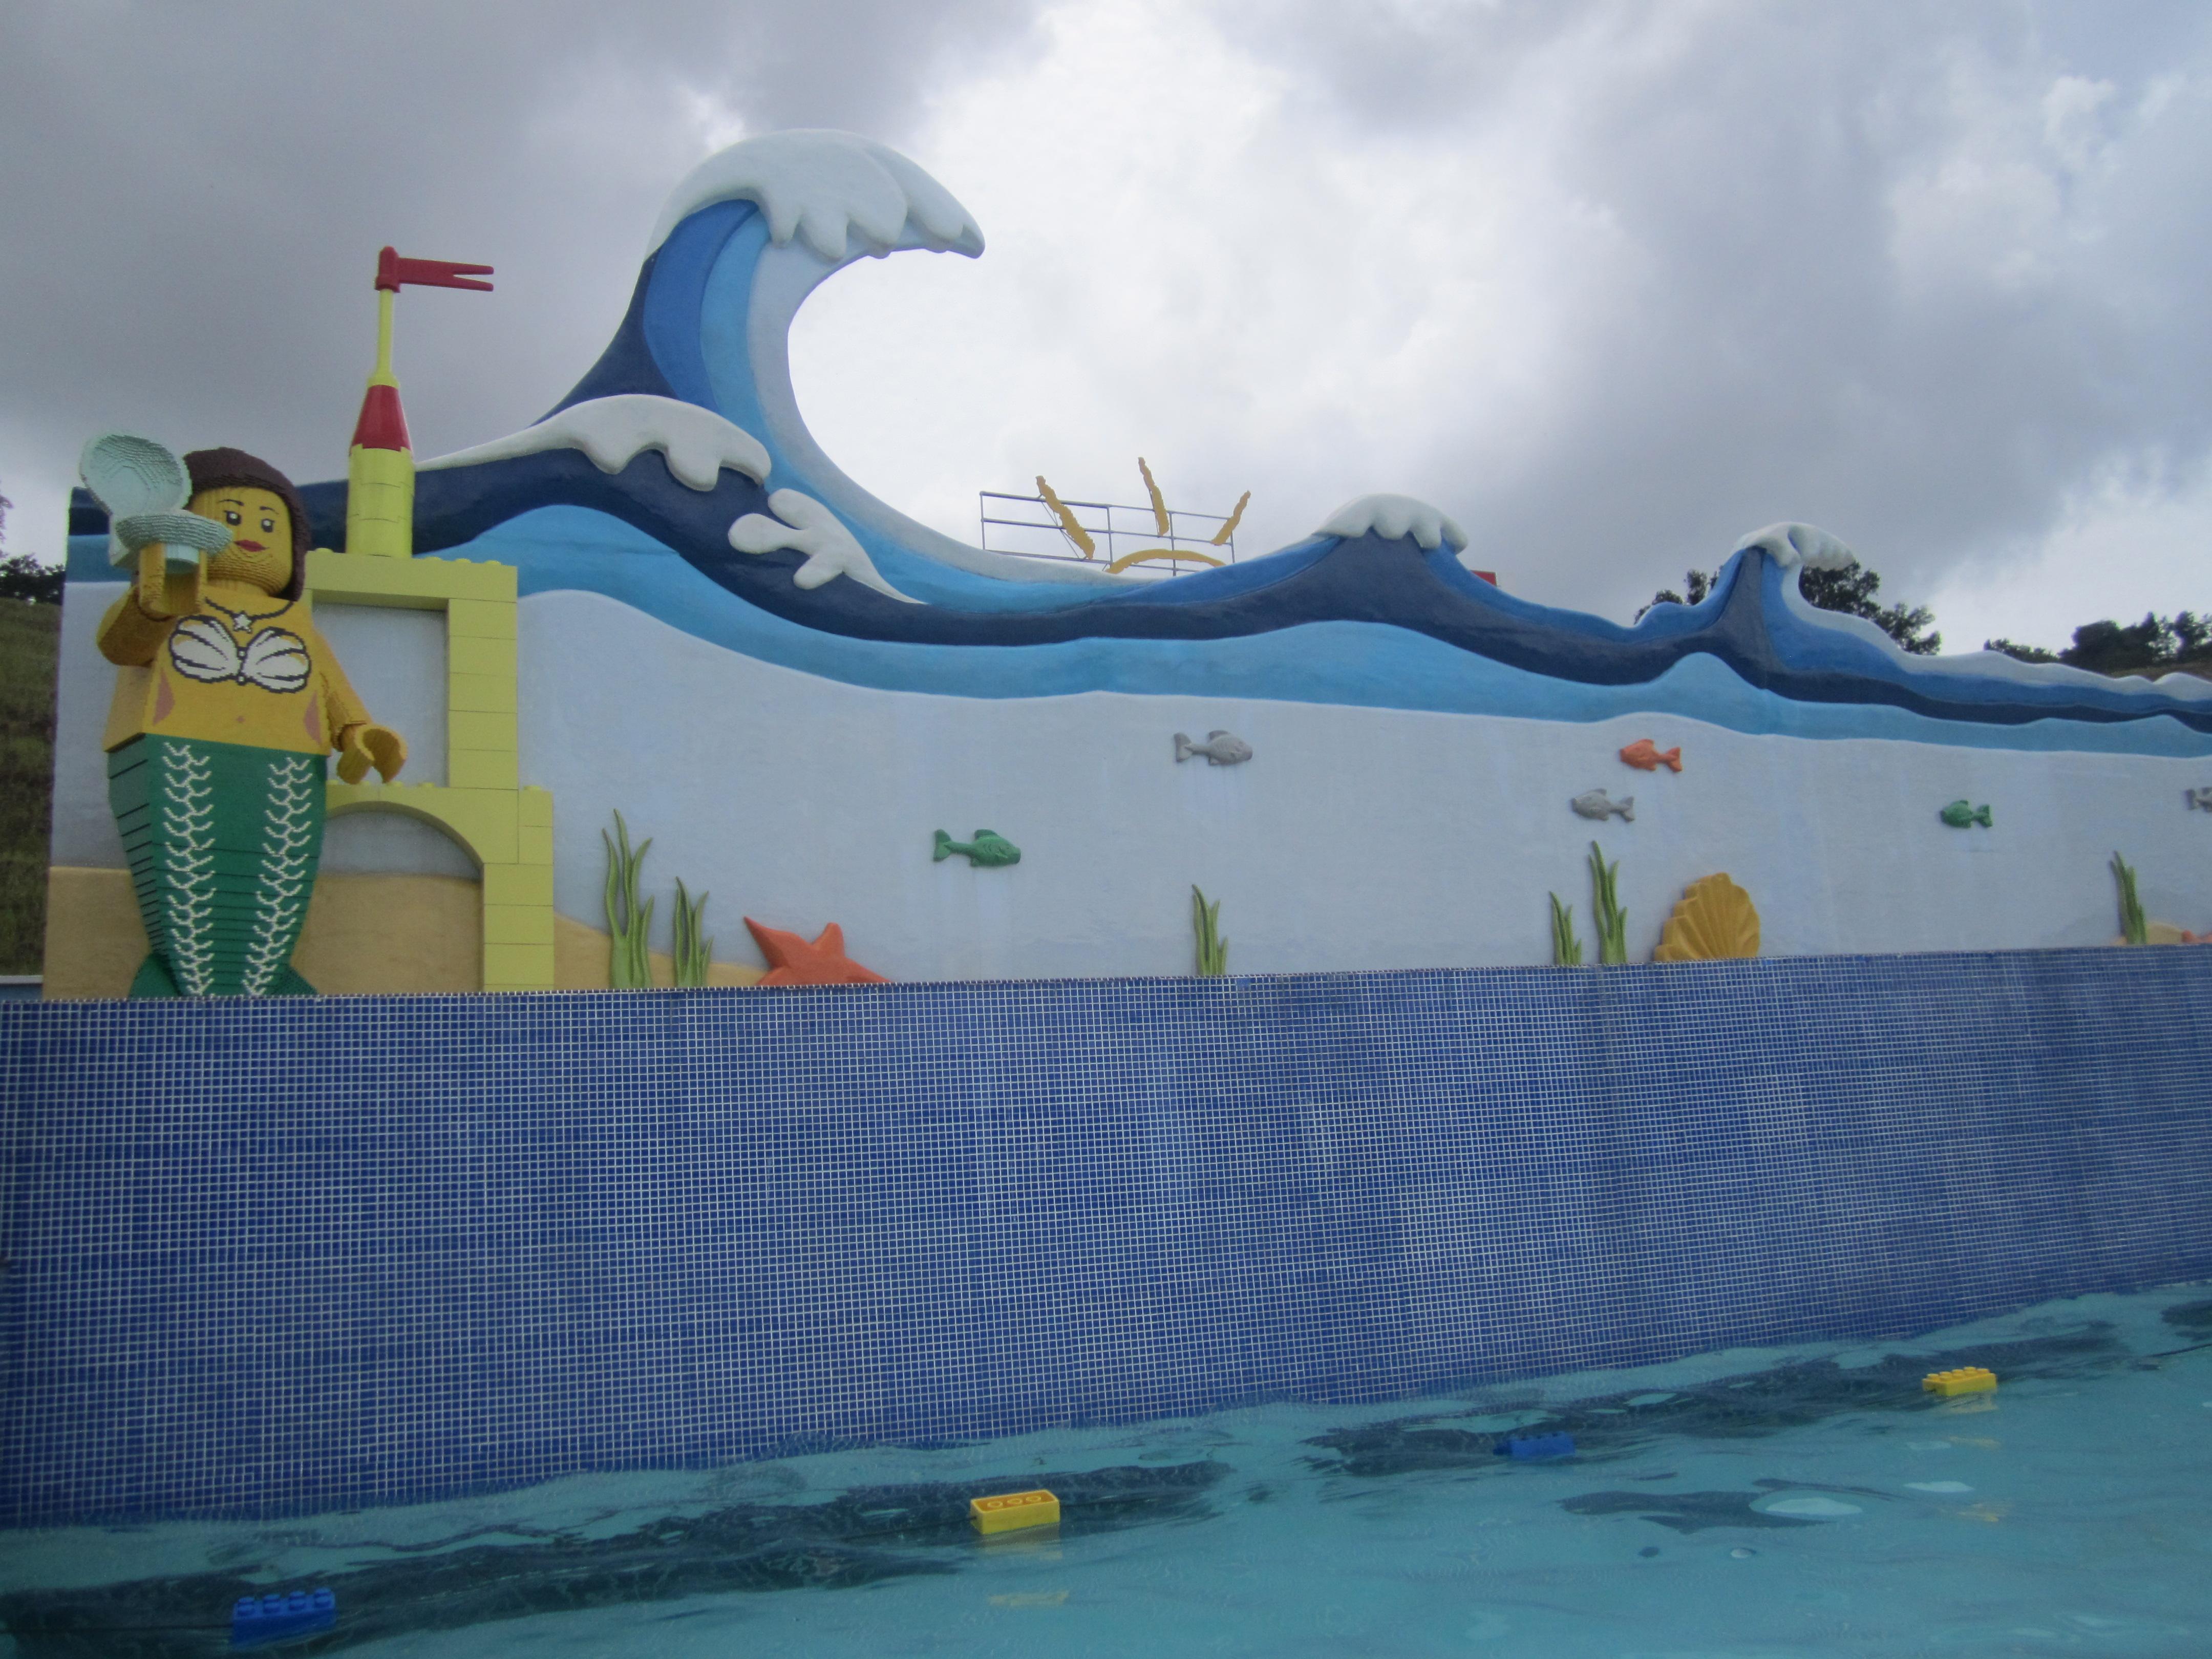 Kolam Renang Intex Center See Through Round Pool 574893 Daftar Swim 57489 Blue Legoland Malaysia Water Park Wave Sculptures